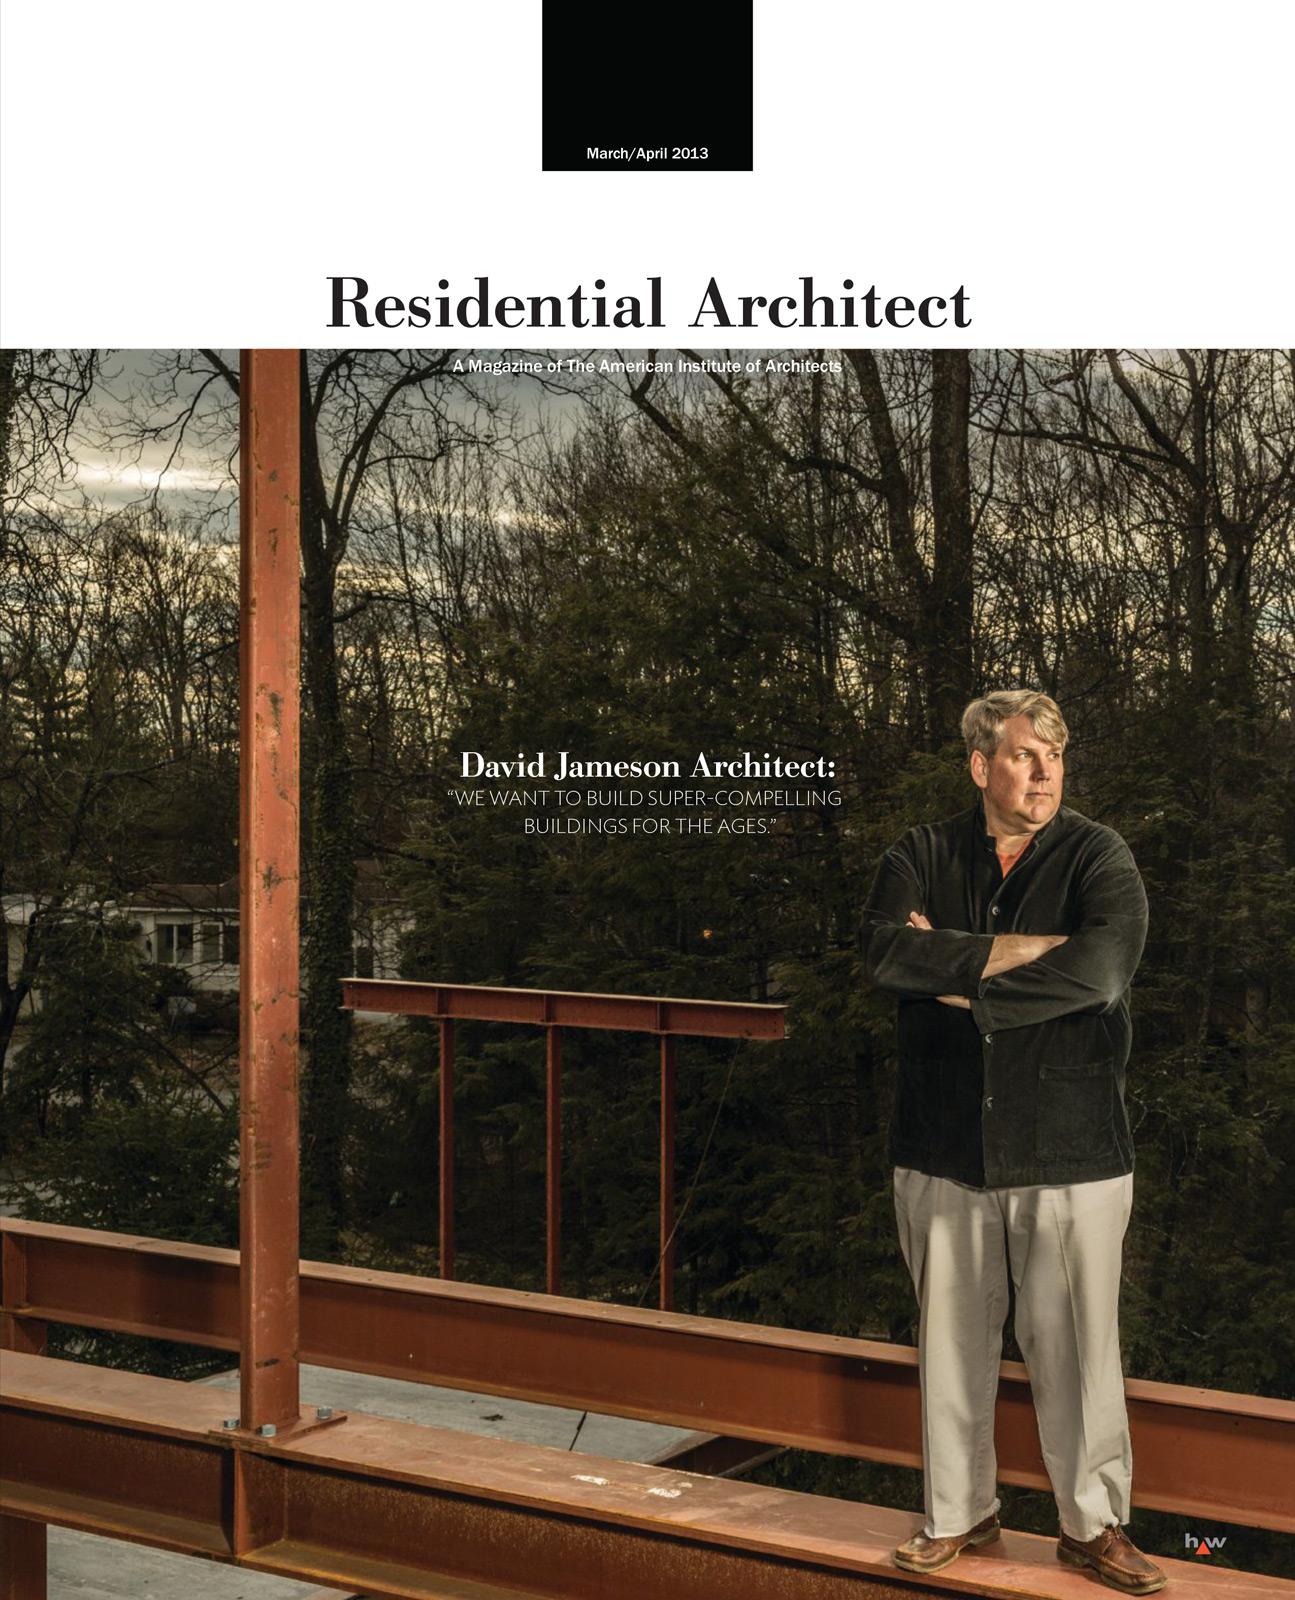 Architect David Jameson